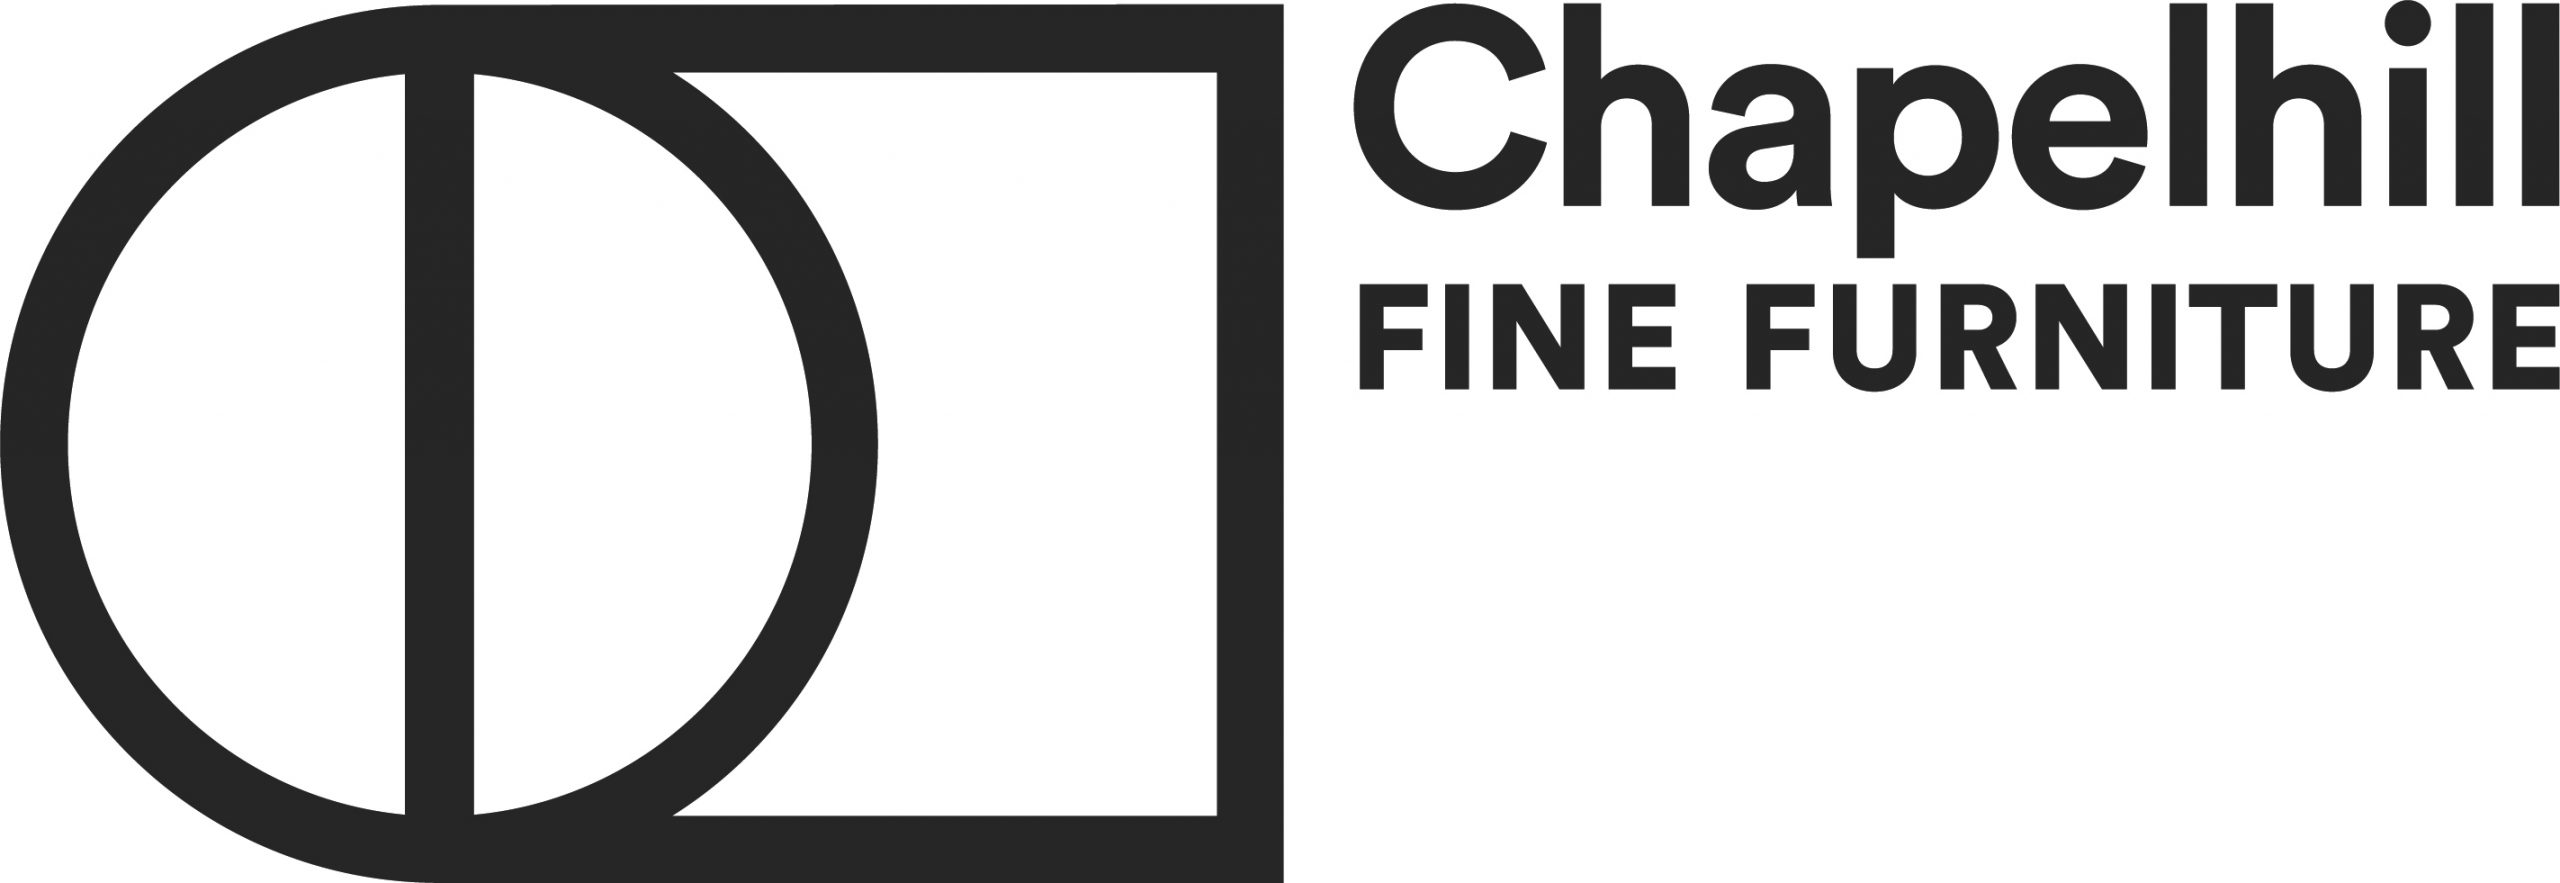 Chapelhill Fine Furniture